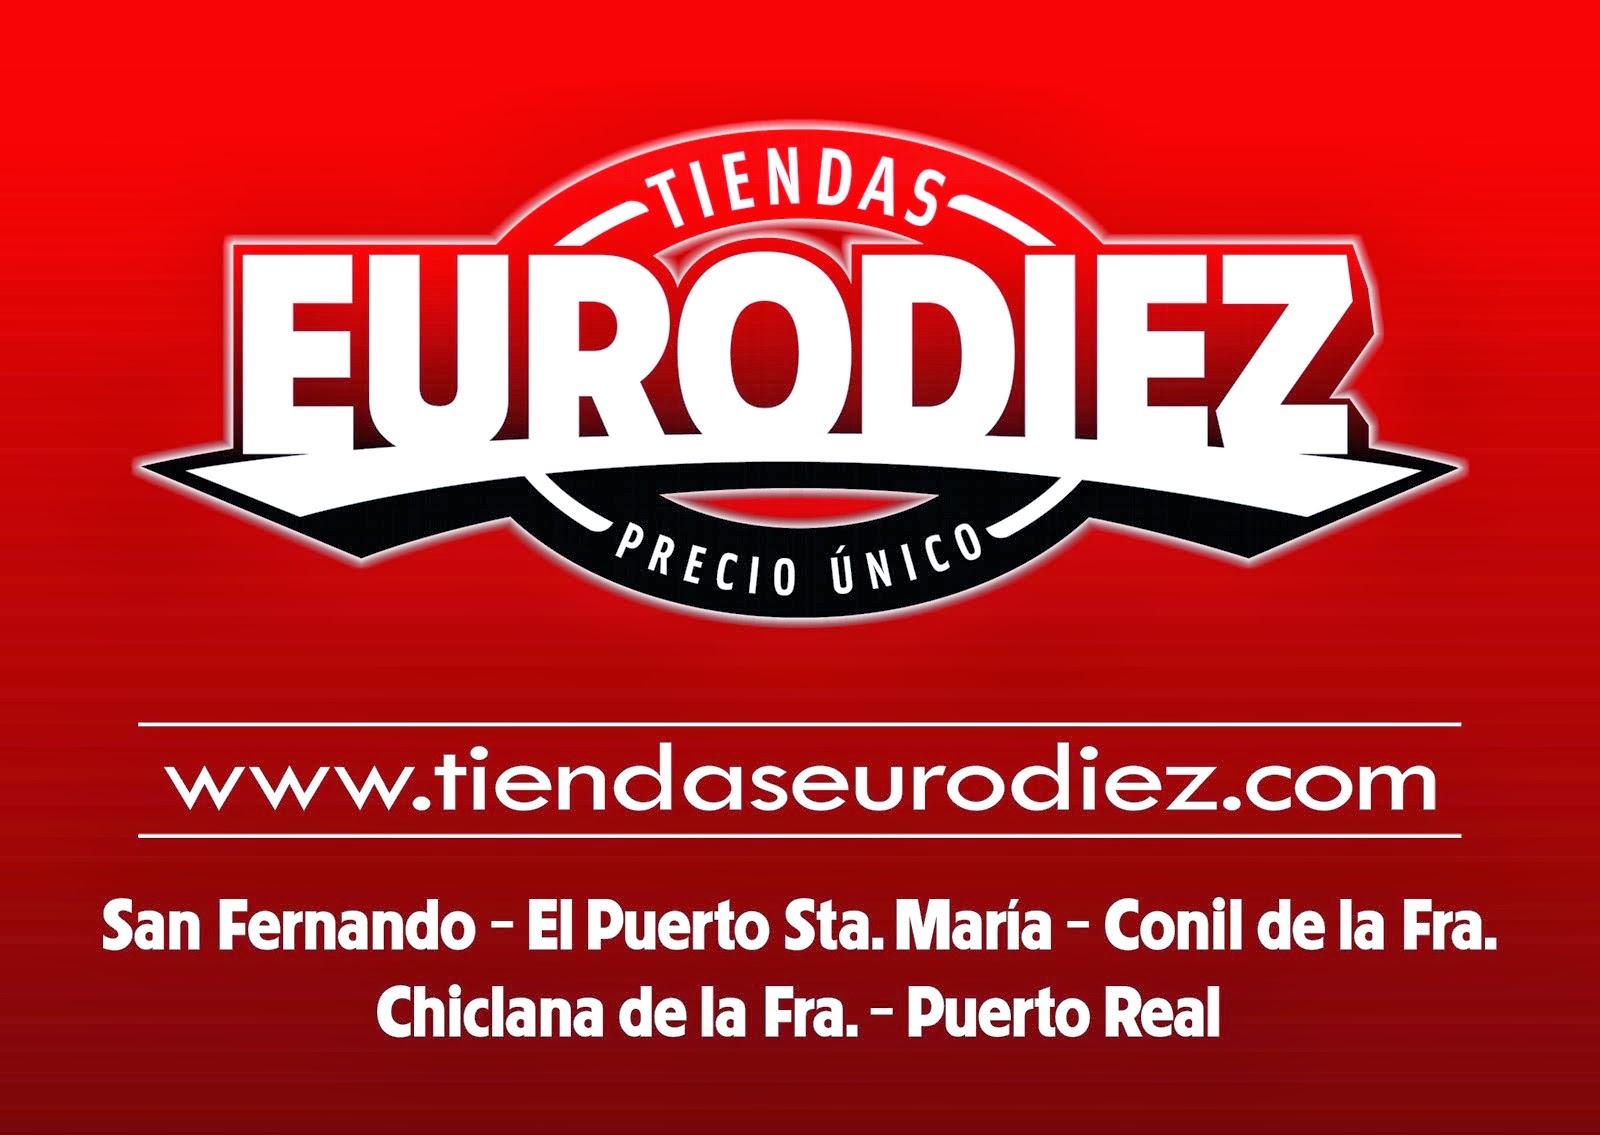 Tiendas Eurodiez